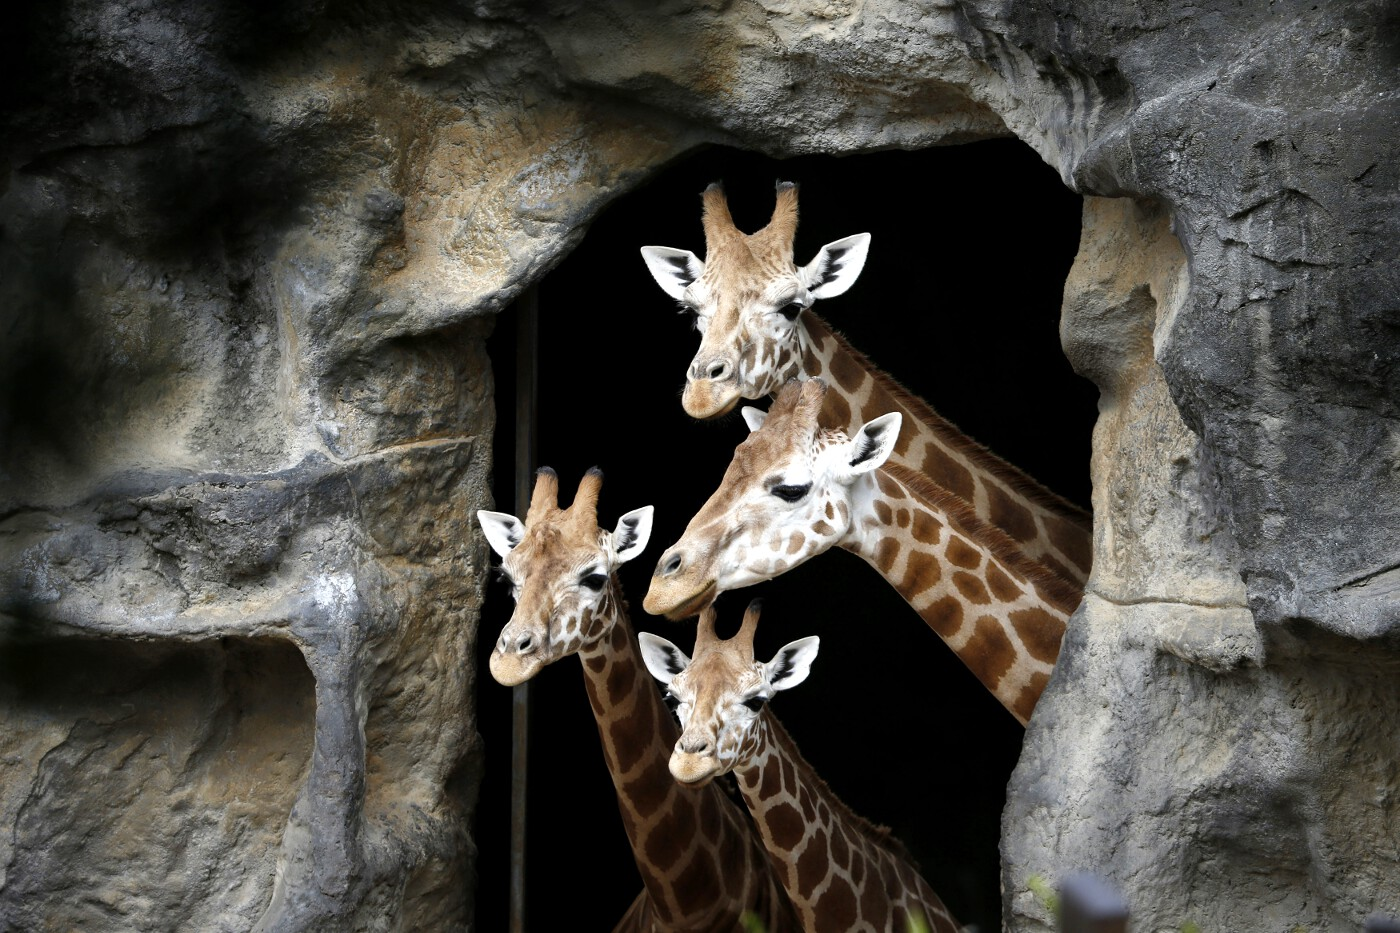 Animals of 2014 - Giraffe family